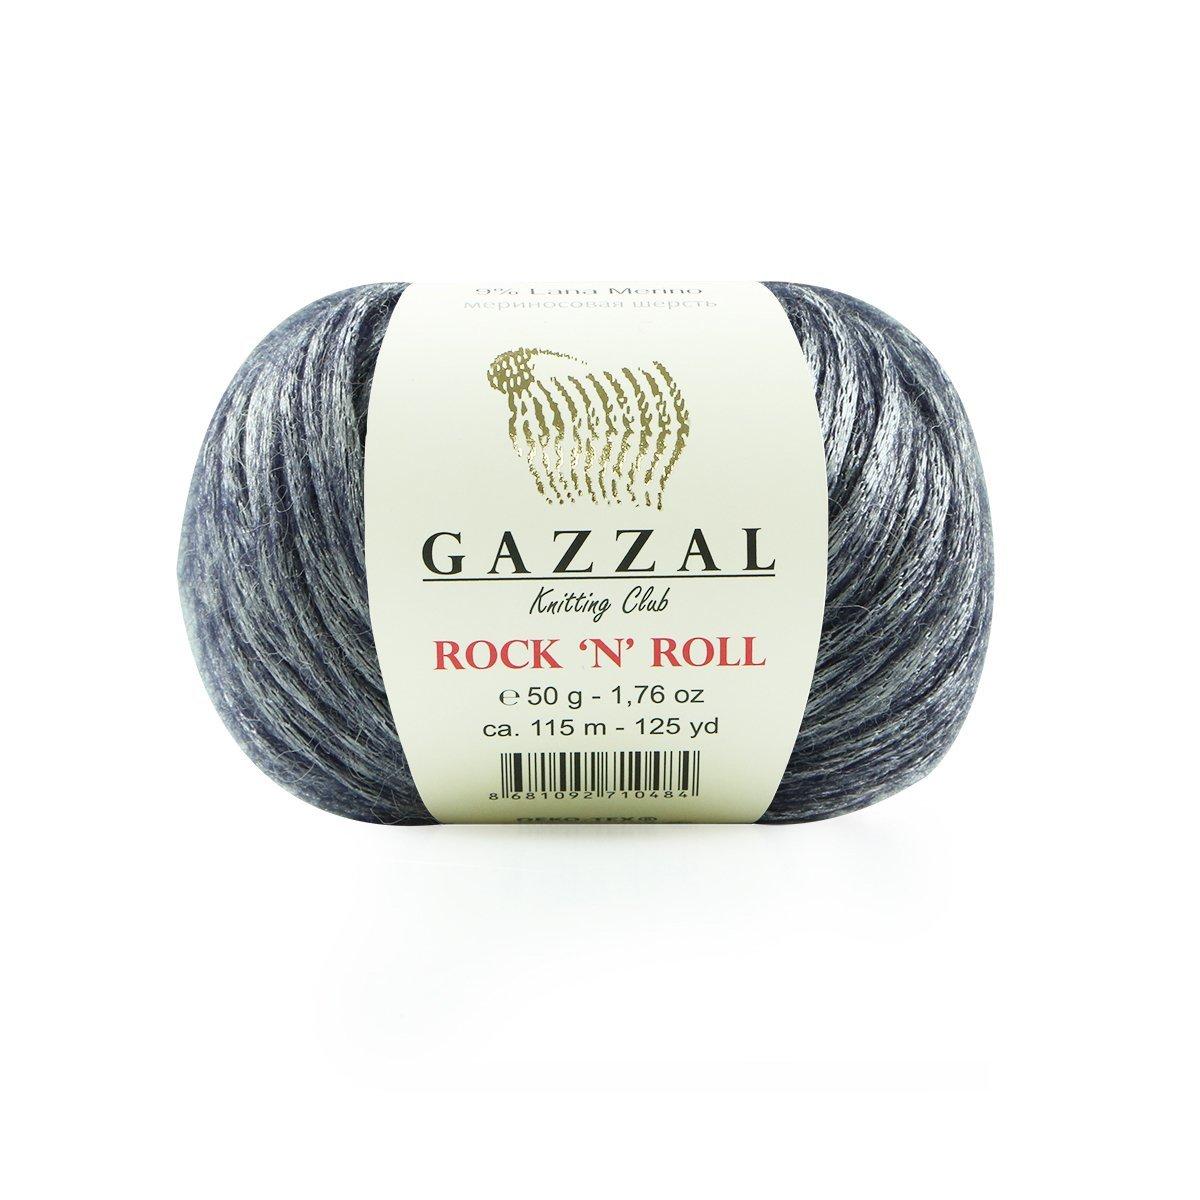 Пряжа Gazzal Rock n Roll 13254 чернила с серебром